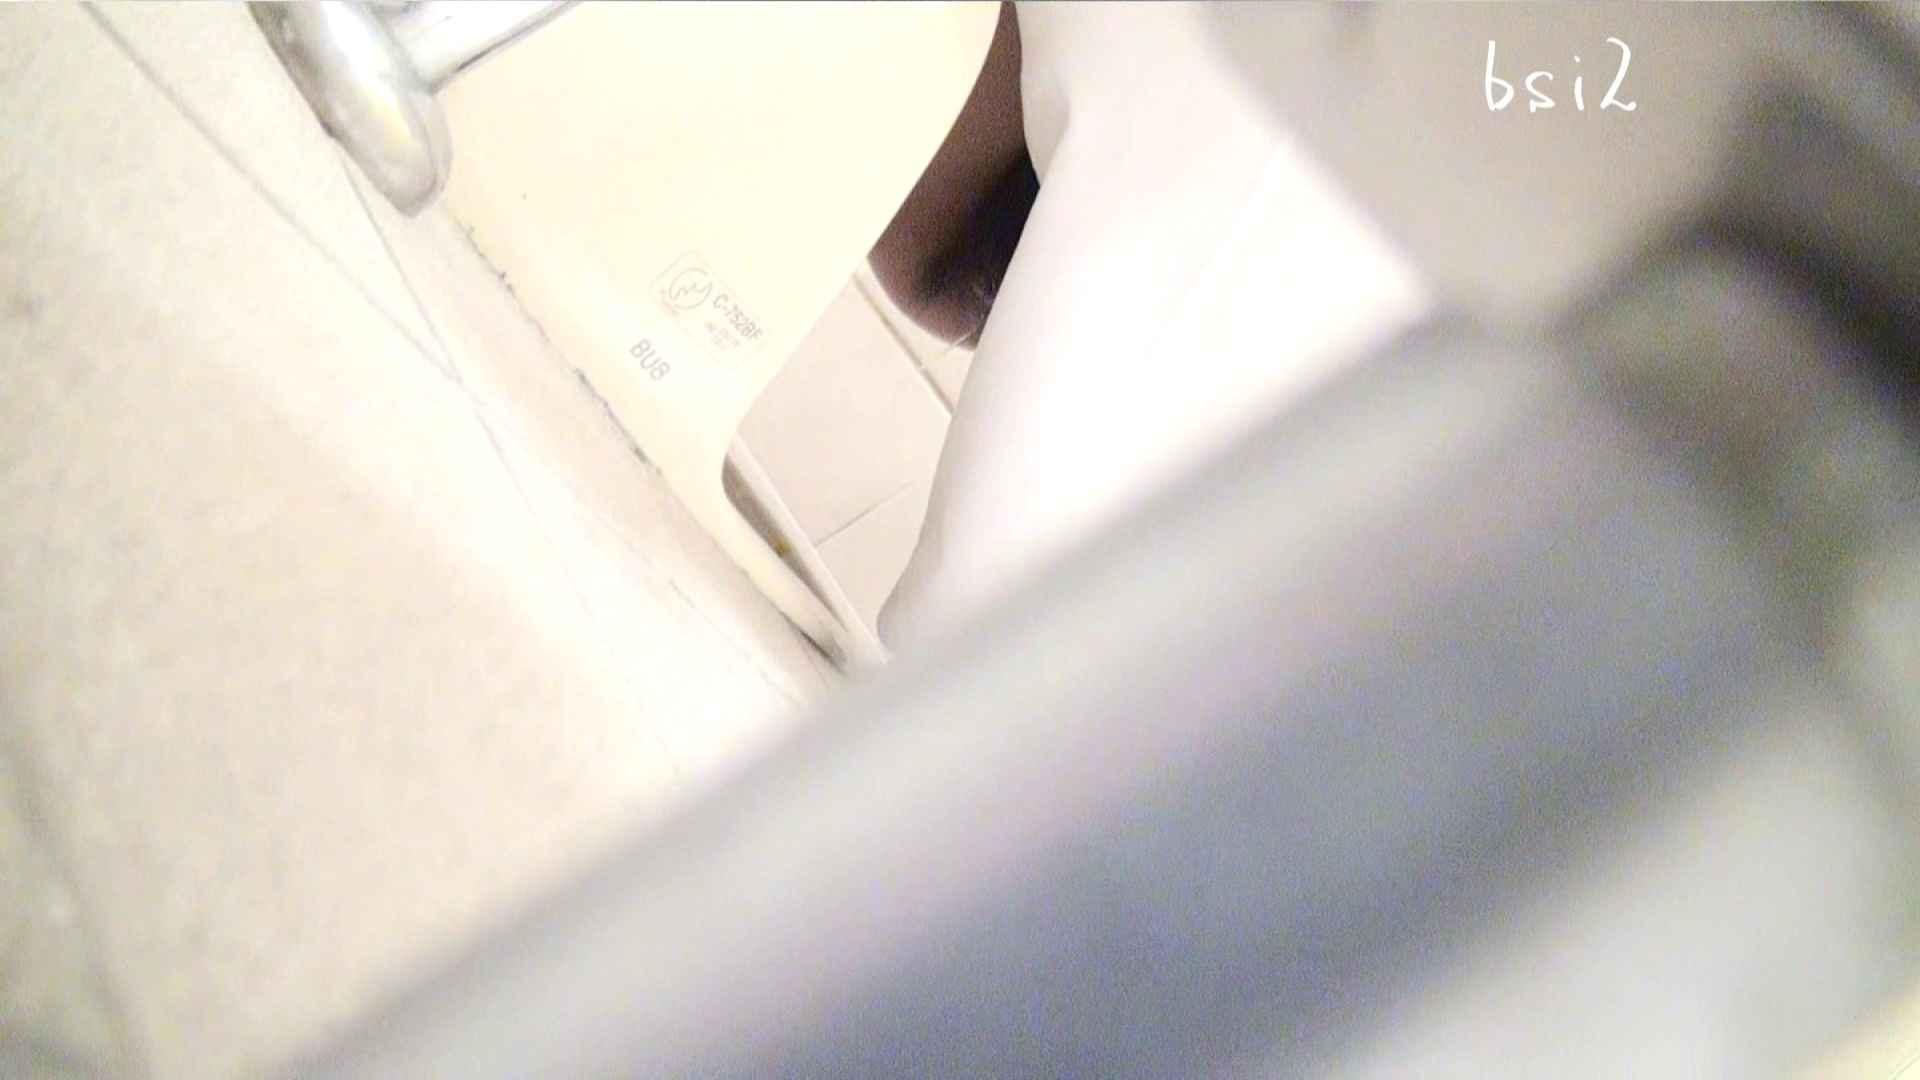 至高下半身盗撮-PREMIUM-【院内病棟編 】VOL2 OLの実態   盗撮  67pic 29